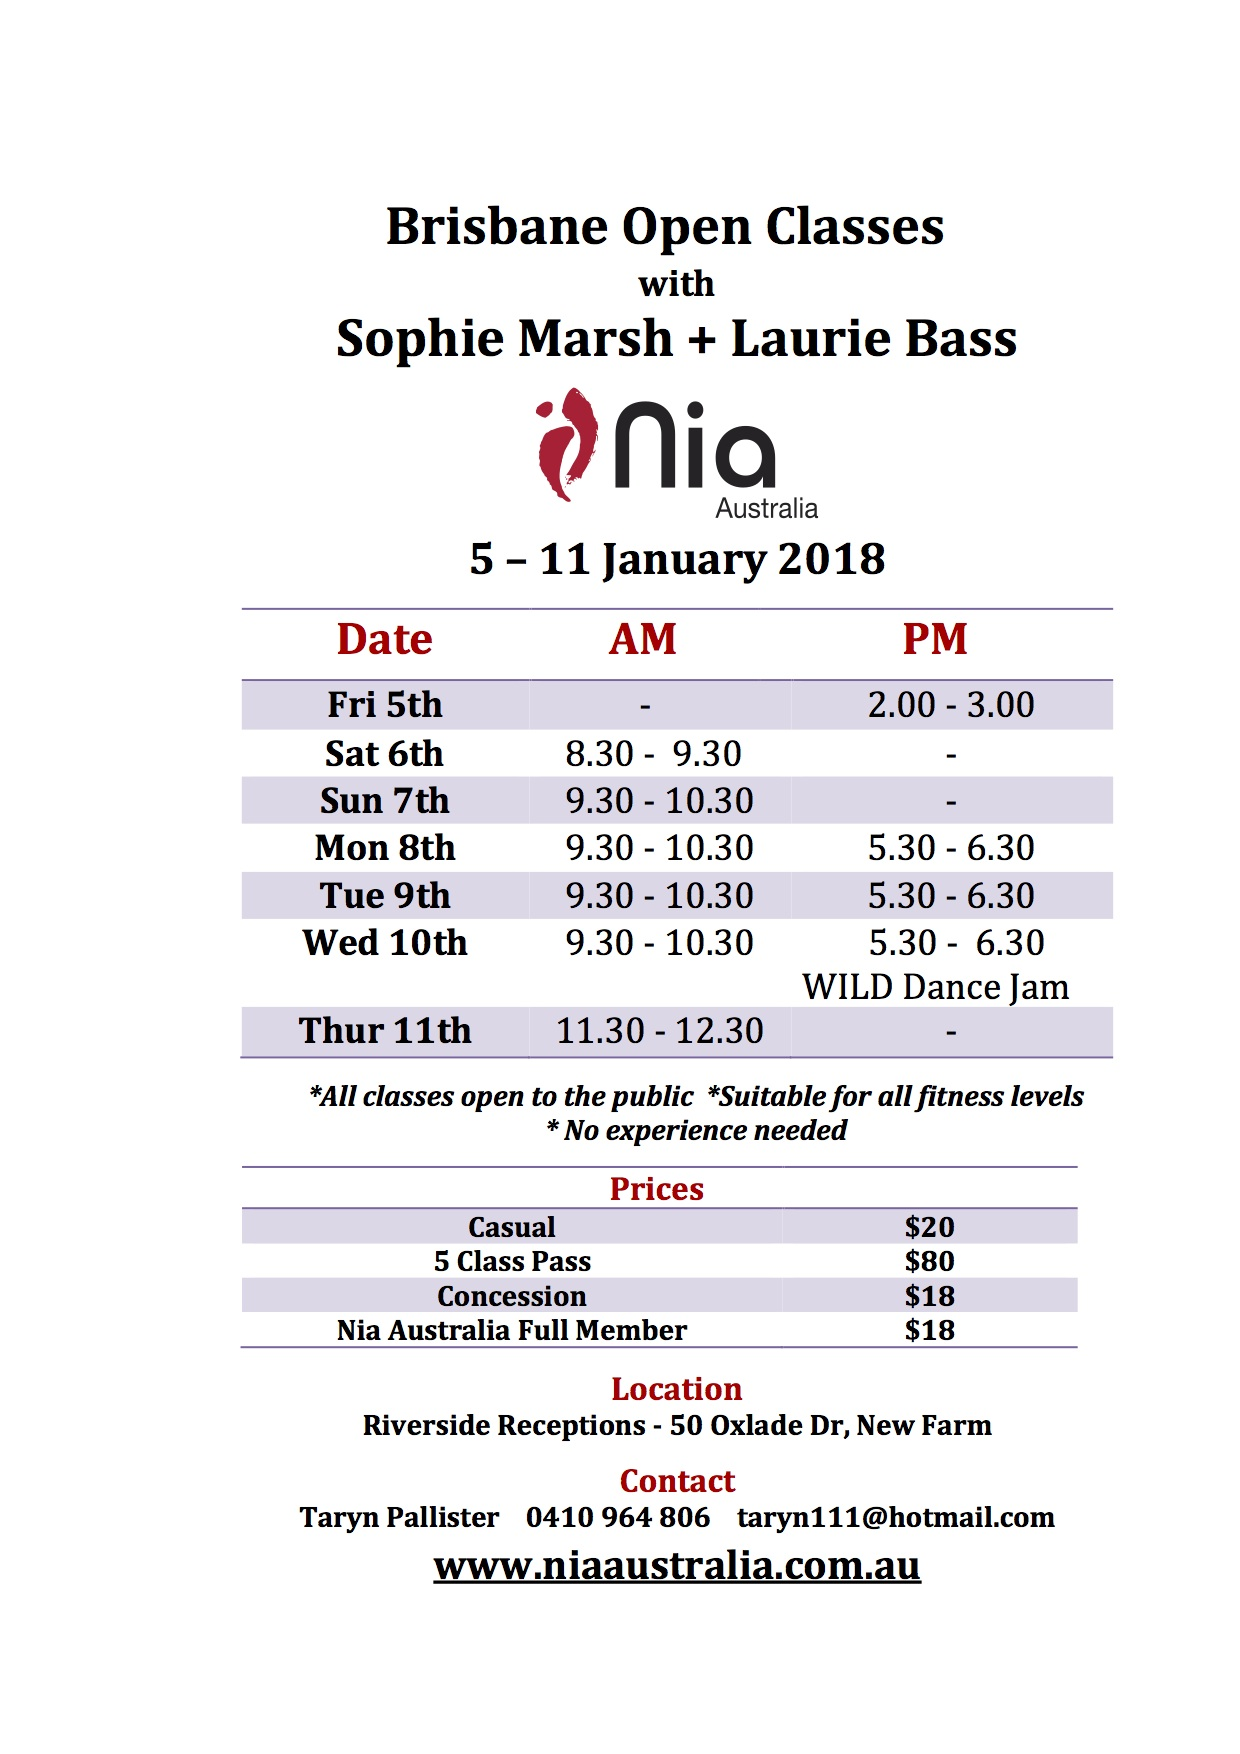 Brisbane White Belt open class schedule